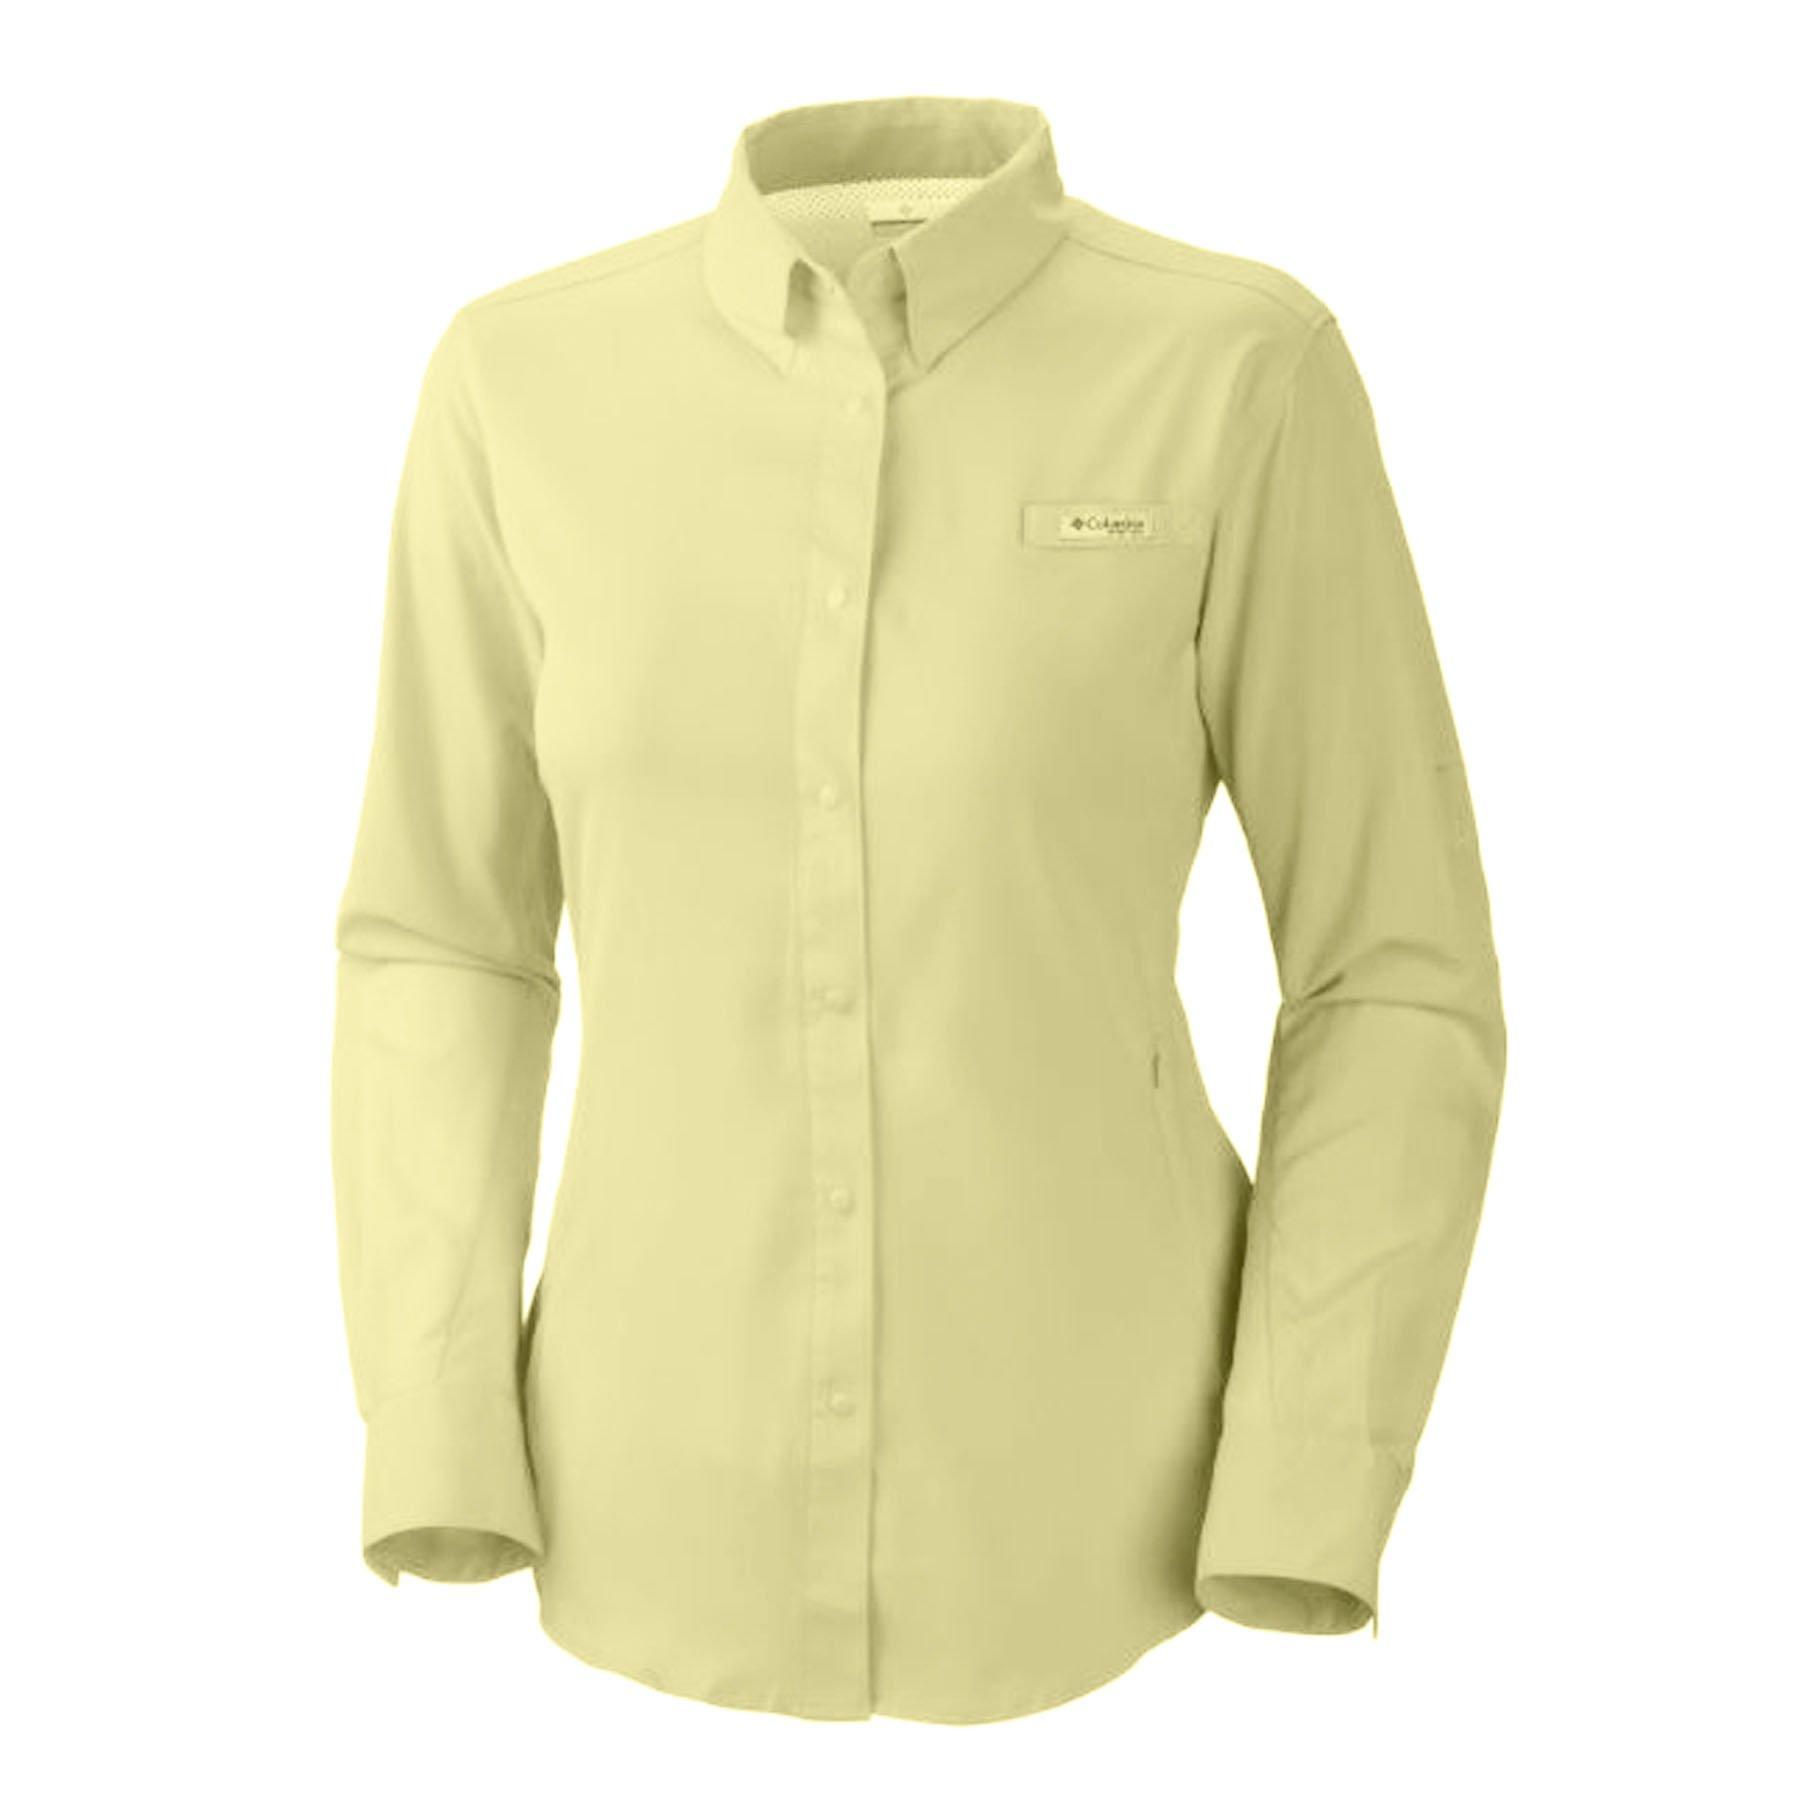 82bf4297743 Columbia Womens PFG Tamiami II Long Sleeve Shirt